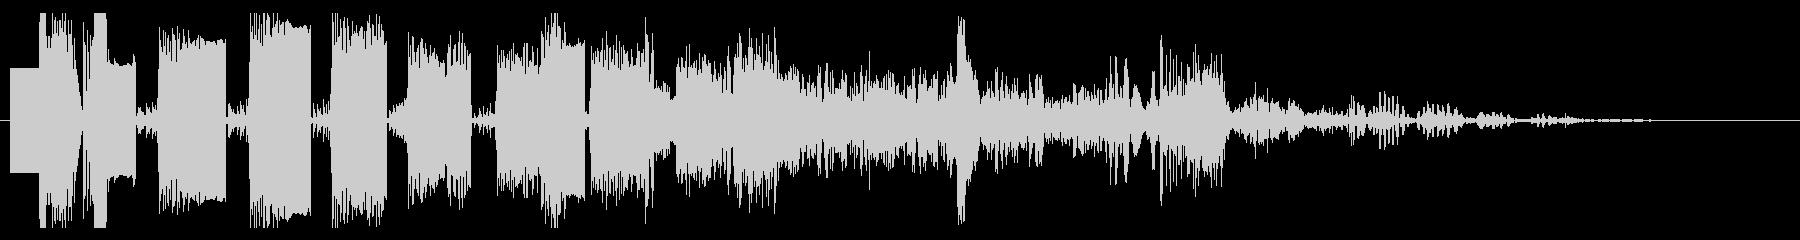 KANT8bit効果音082446の未再生の波形